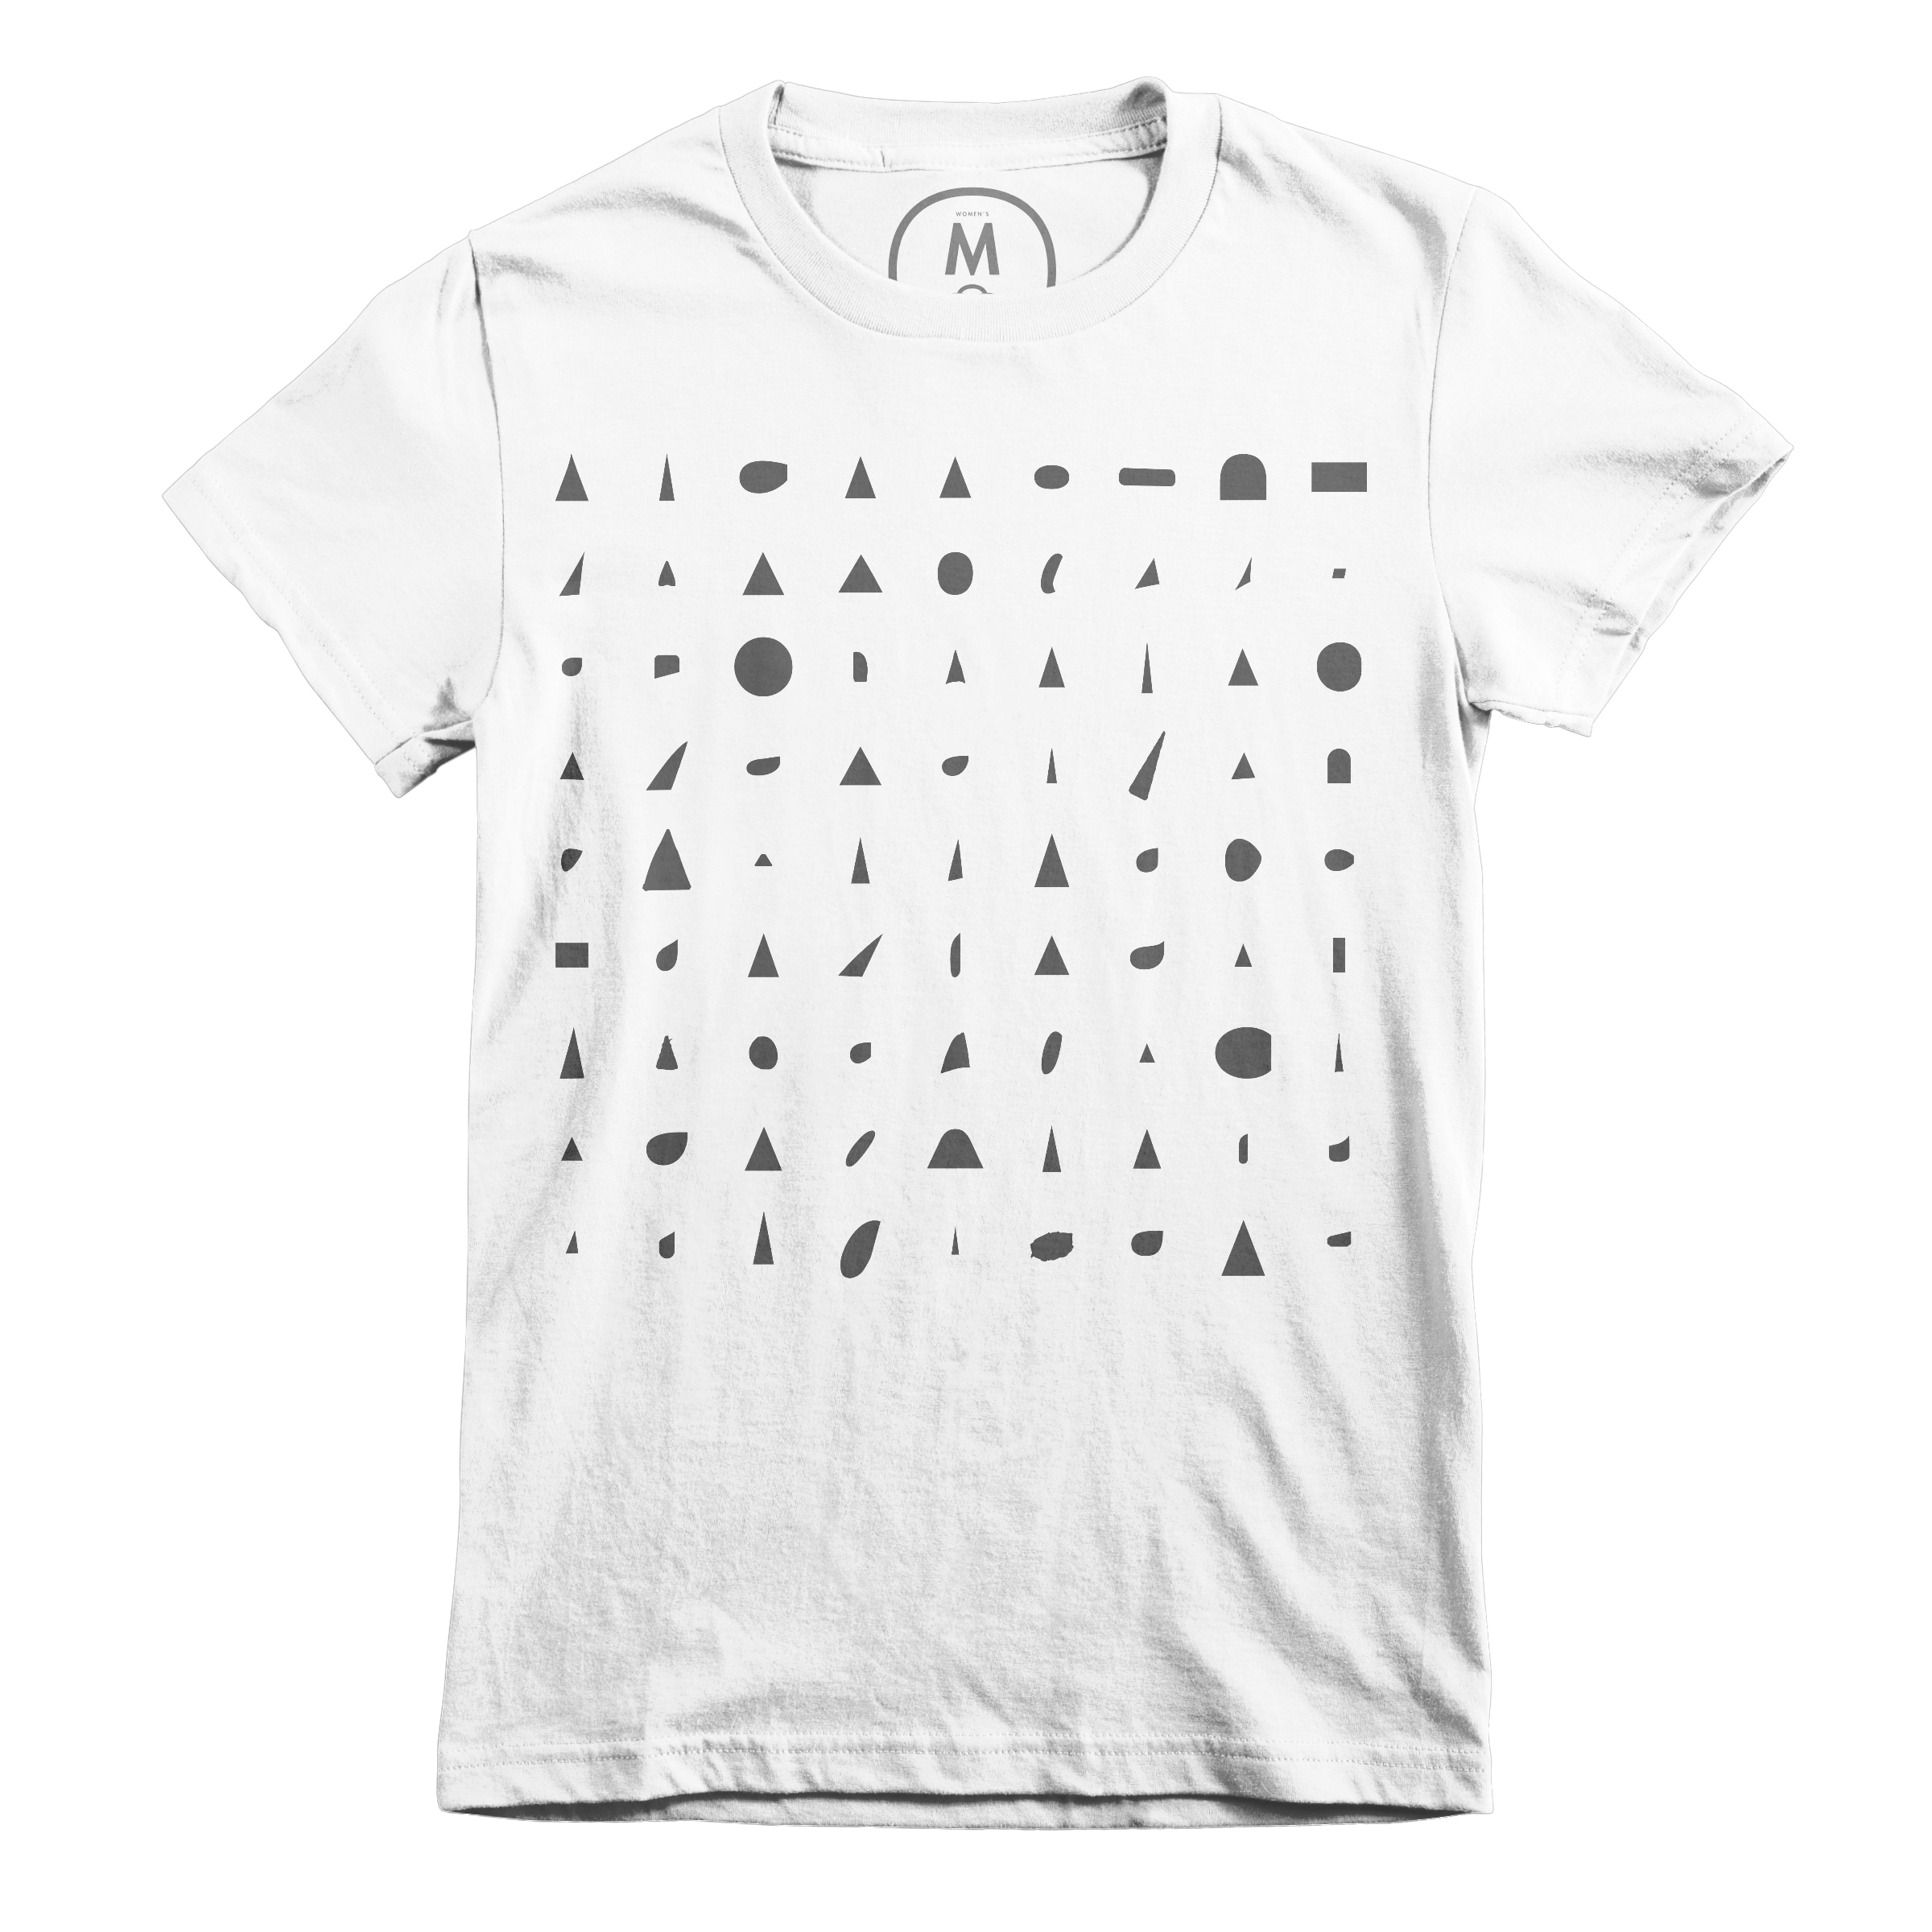 81 A-holes White (Women's)